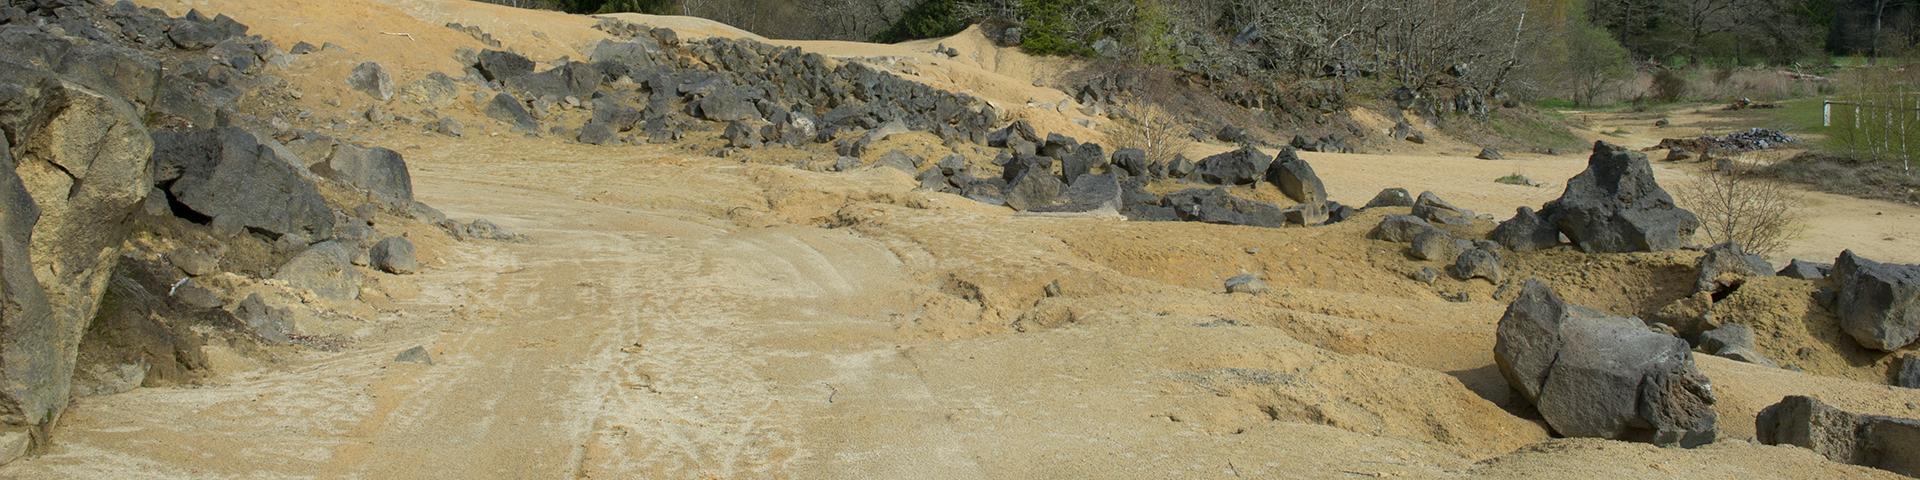 A former dump of mine tailings, Puy-de-Dôme